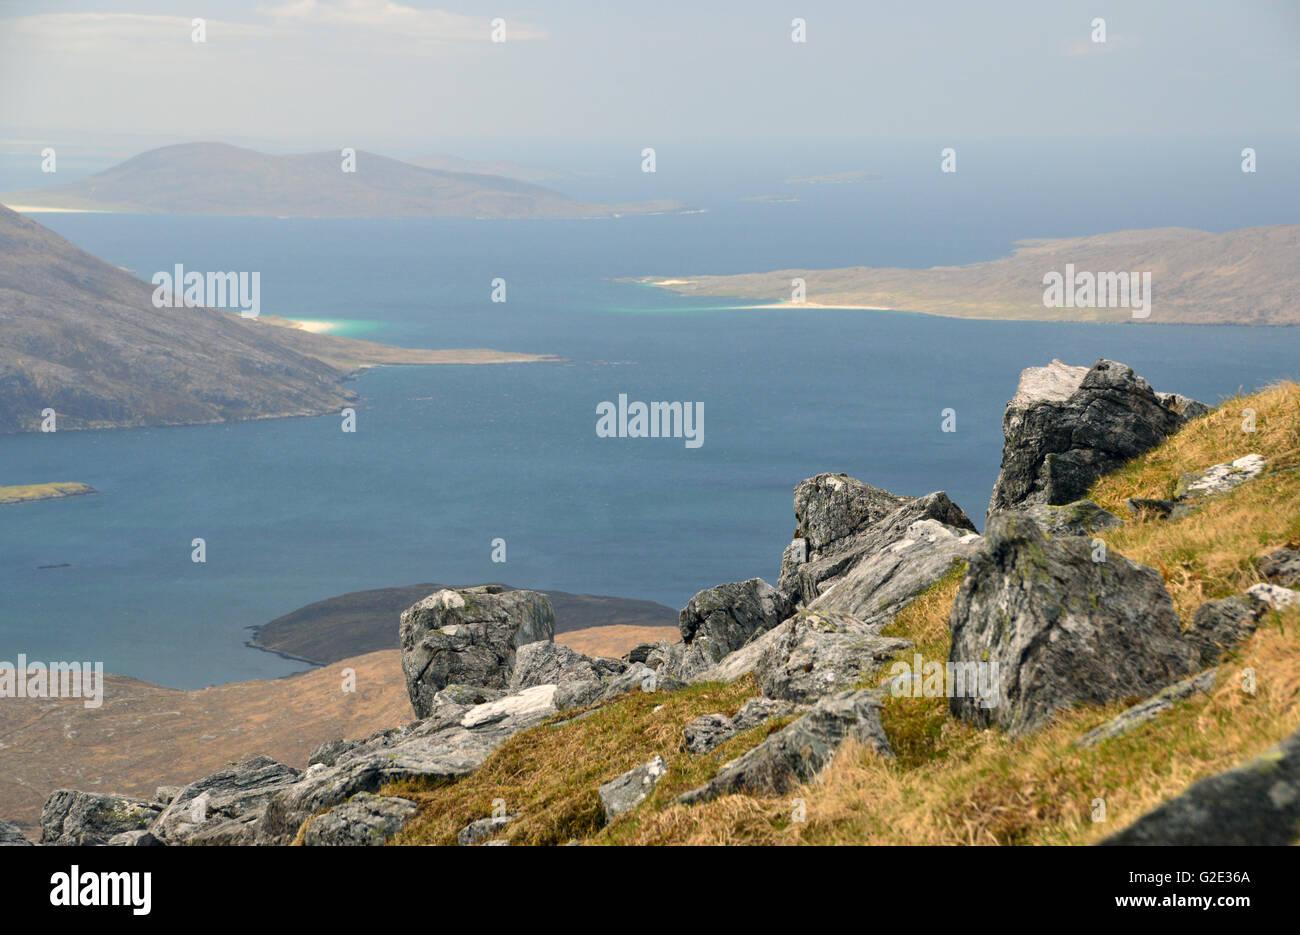 Loch a' Siar and the Sound of Taransay from the Corbett An Cliseam (Clisham) North Harris, Western Isles, Scotland - Stock Image